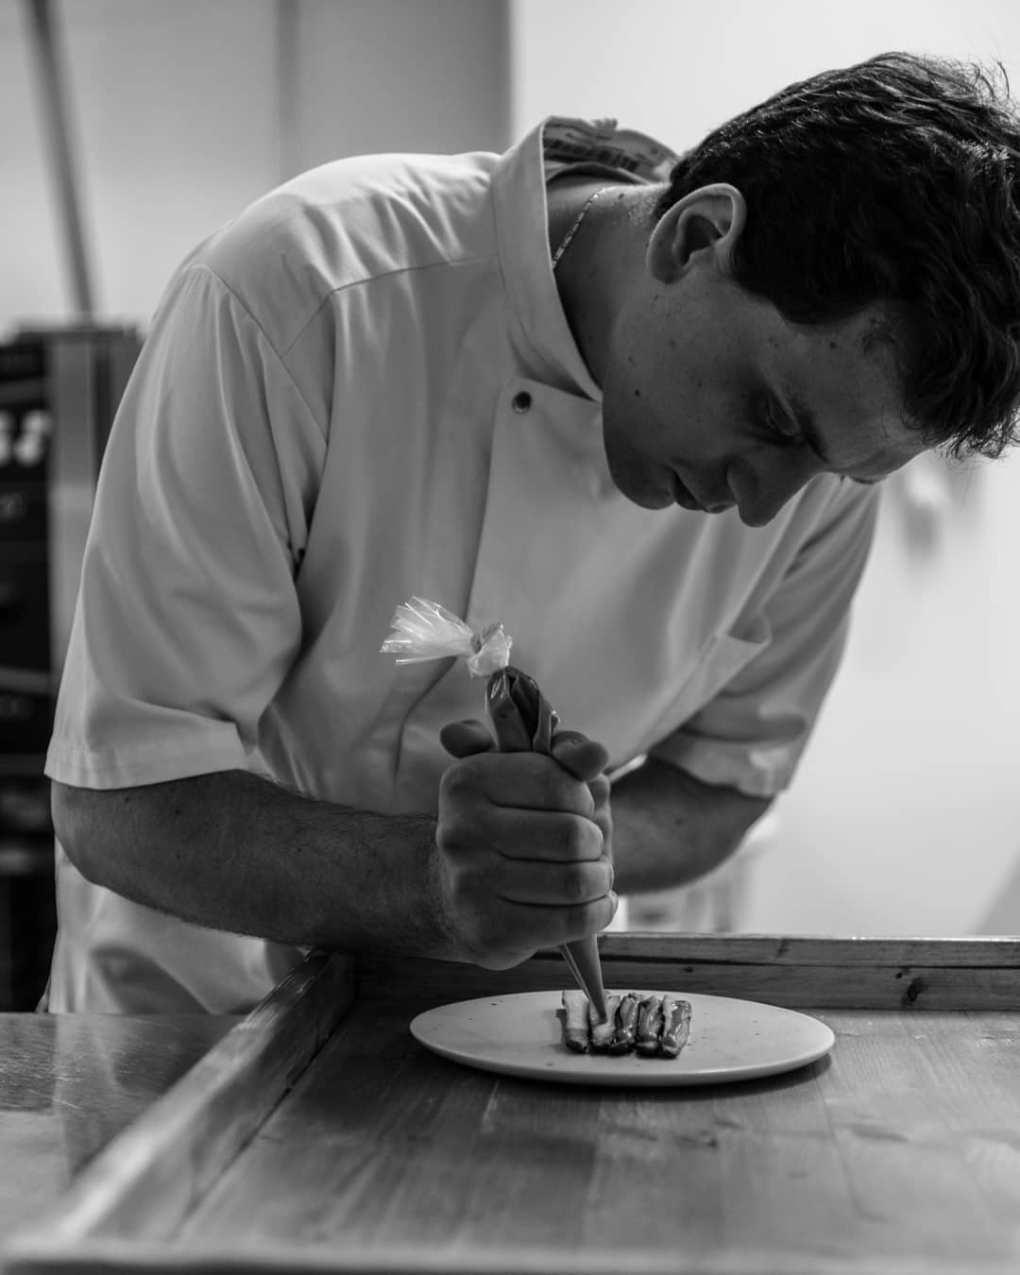 Chef Nicola Fanetti at Restaurant Brace